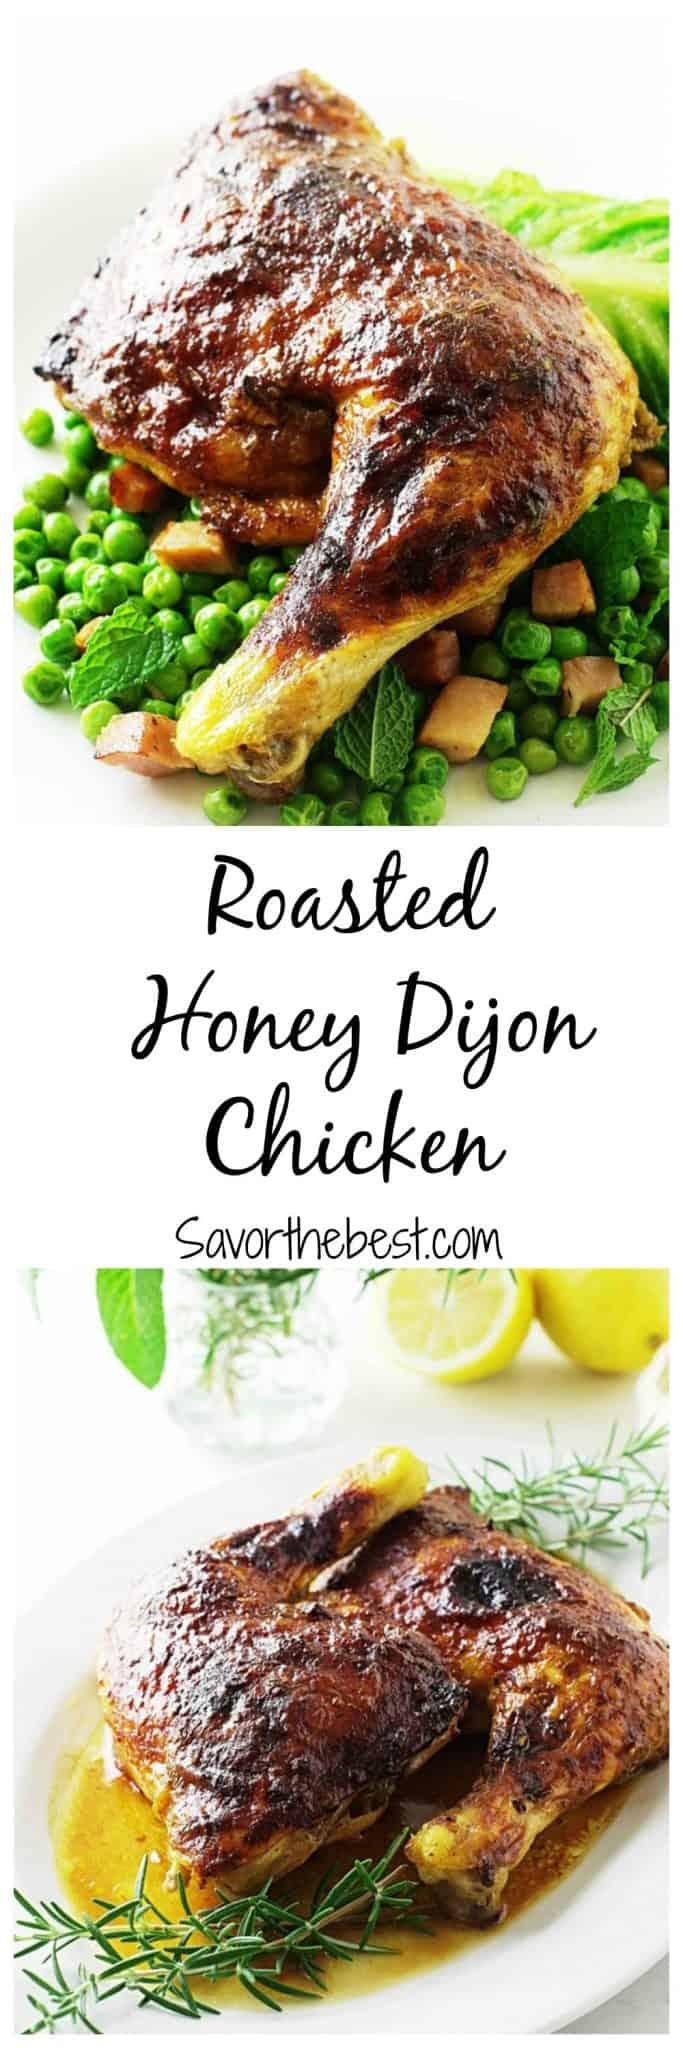 Roasted Honey-Dijon Chicken - Savor the Best